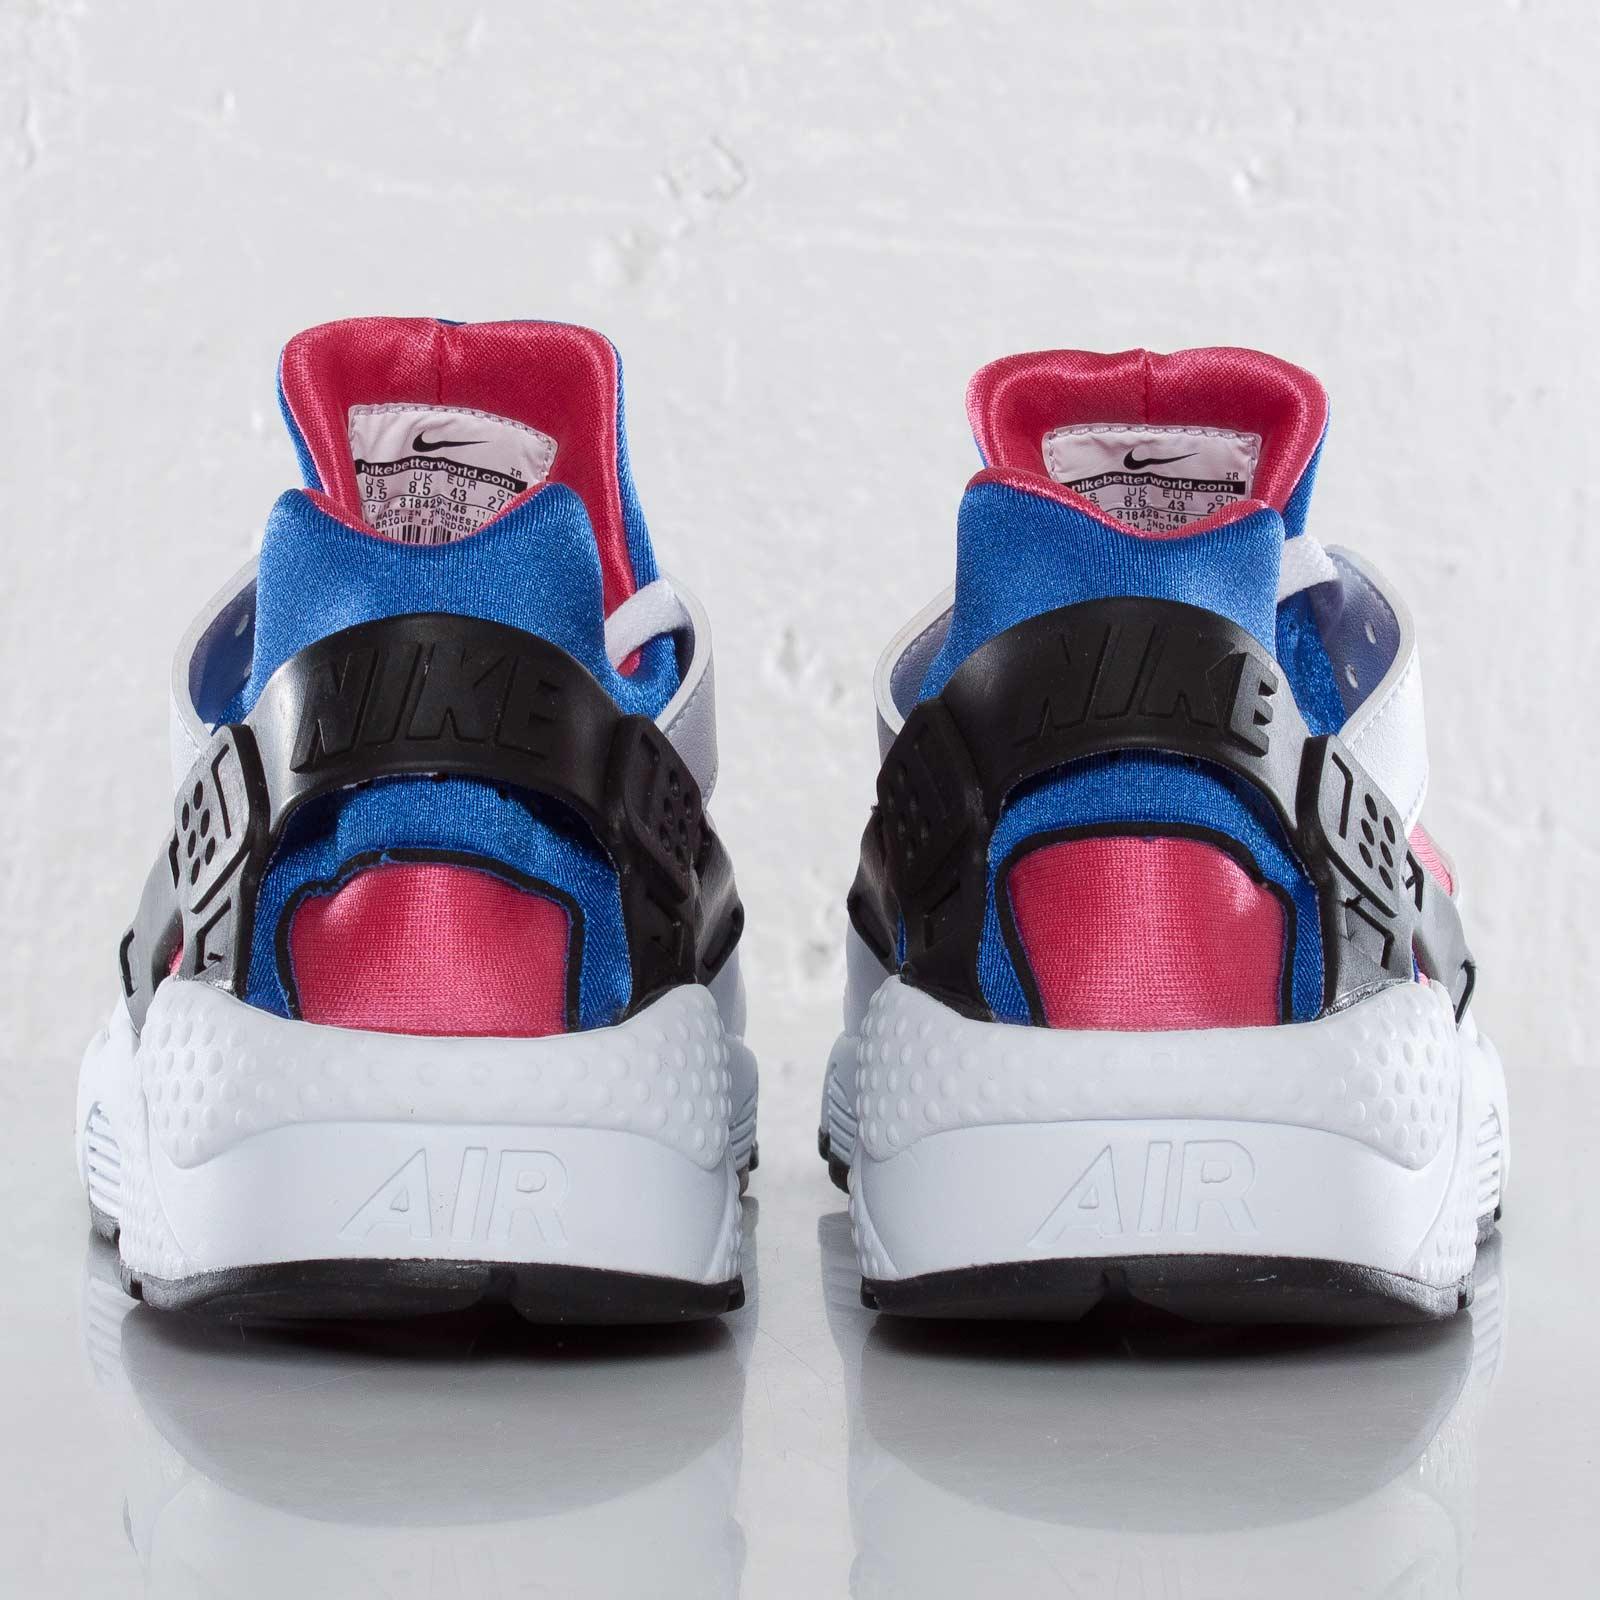 67618da3ecf7 Nike Air Huarache - 318429-146 - Sneakersnstuff